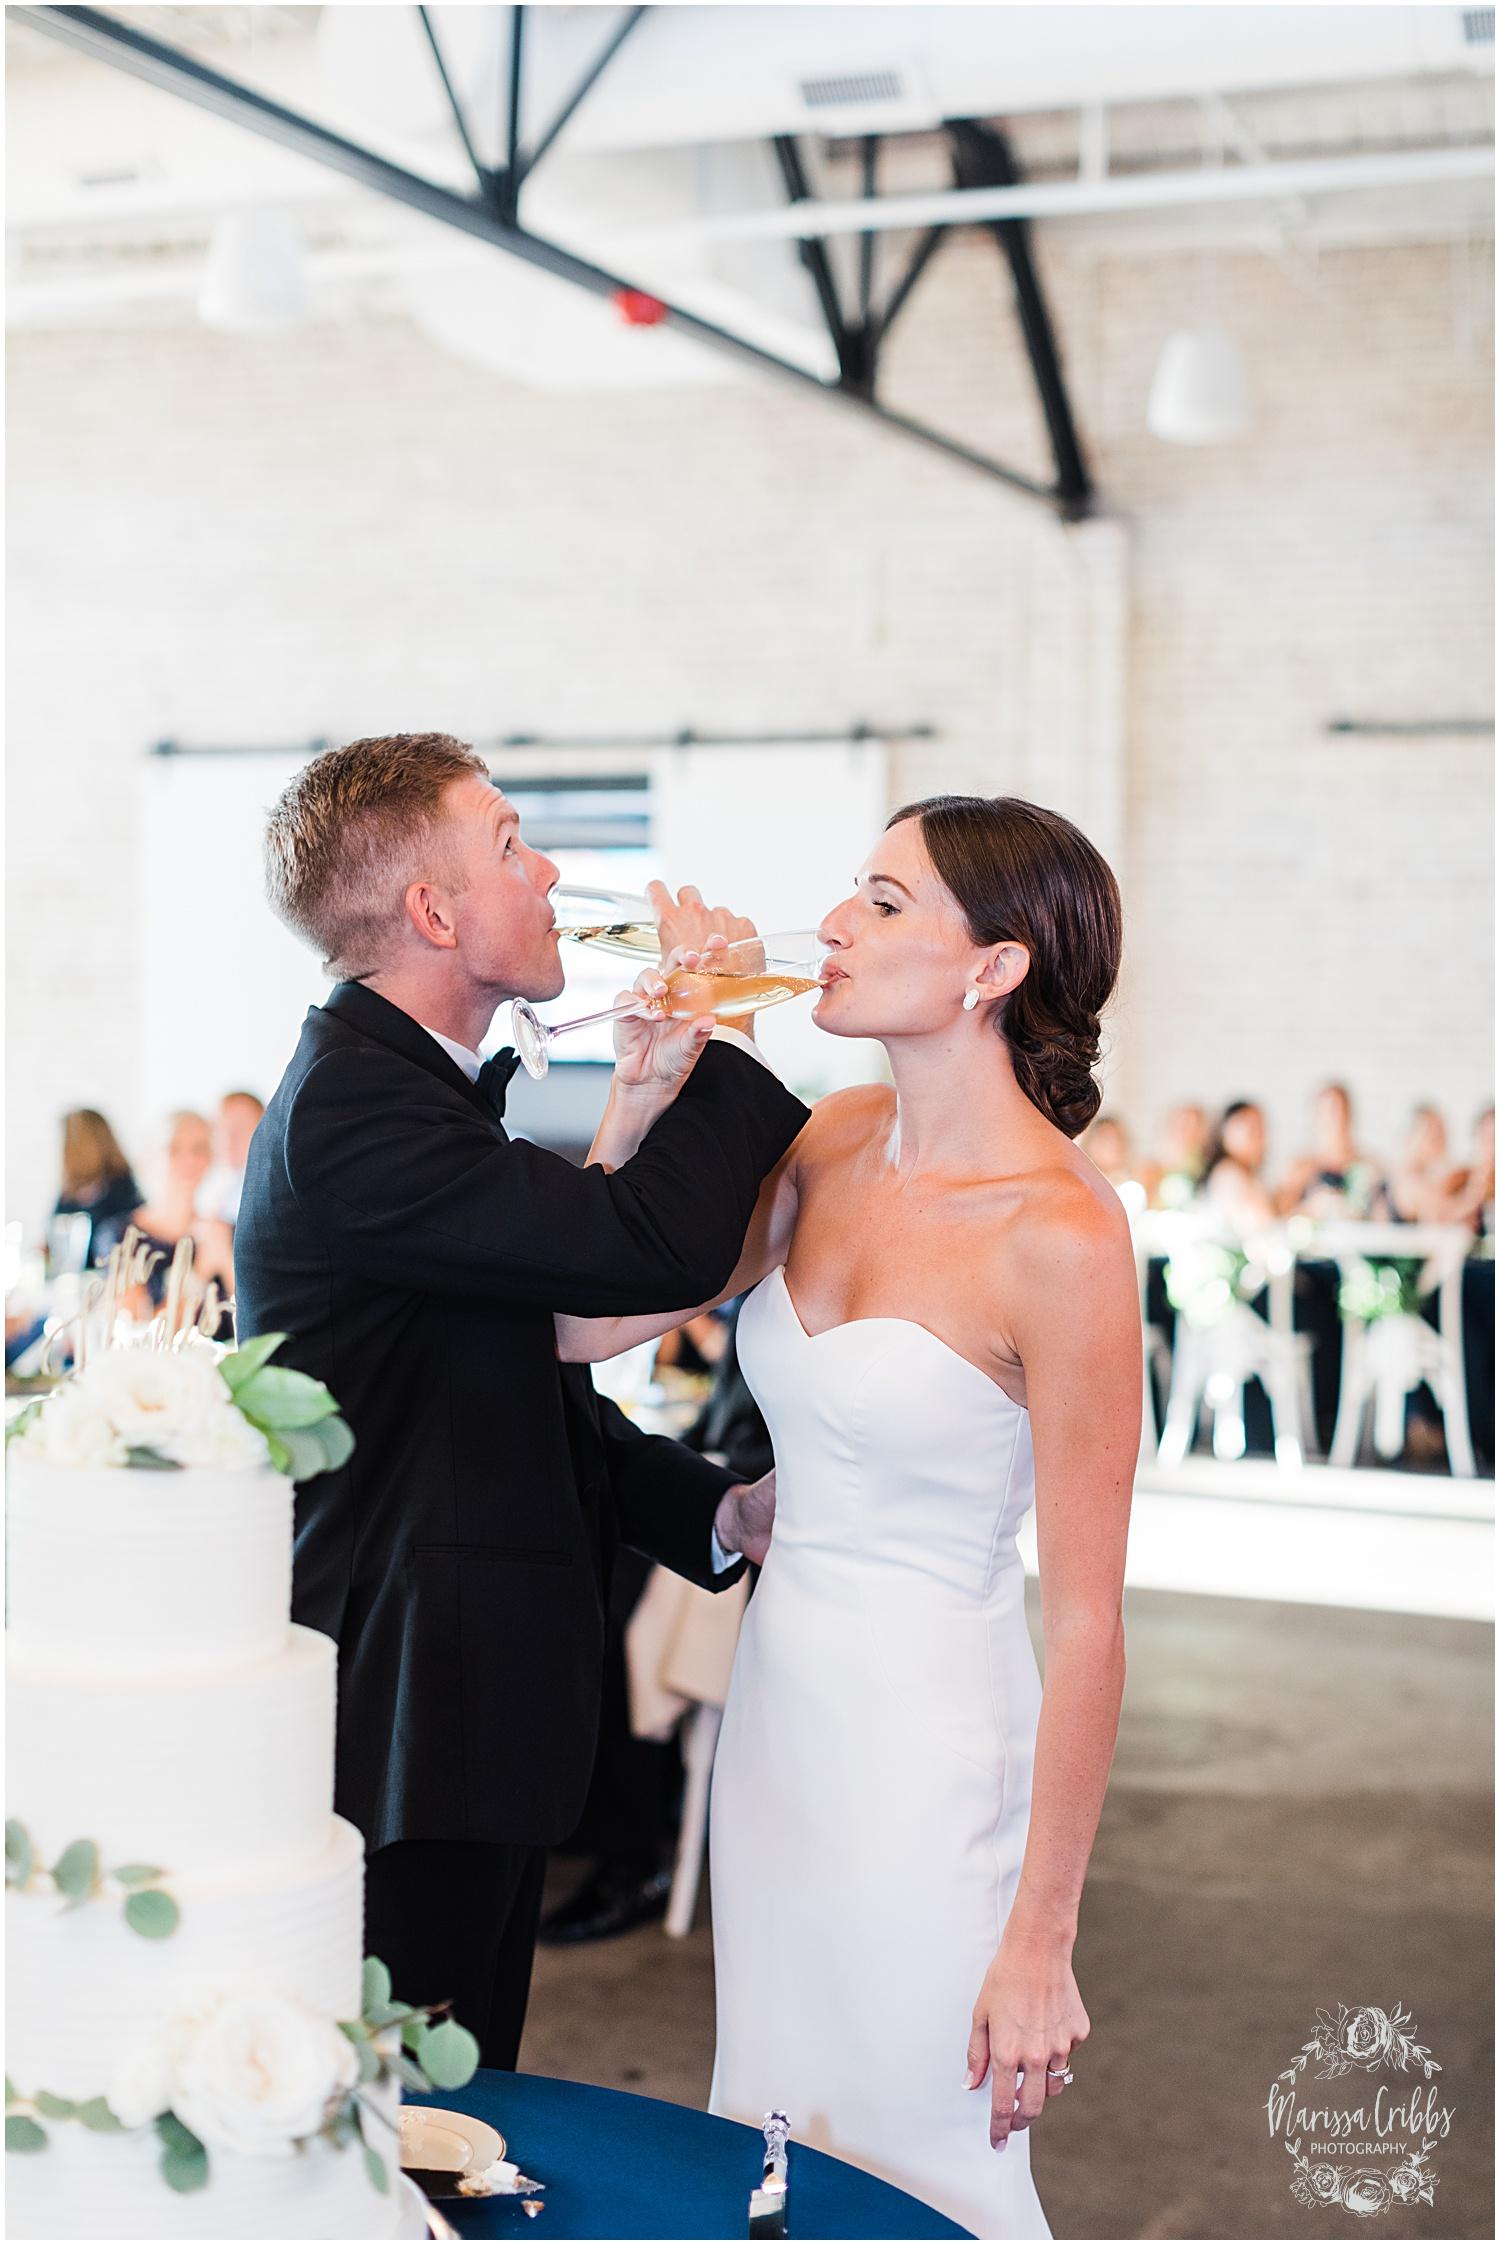 JOANNE & GEORGE MARRIED BLOG | MARISSA CRIBBS PHOTOGRAPHY | THE ABBOTT | KANSAS CITY WEDDING PHOTOS_9150.jpg